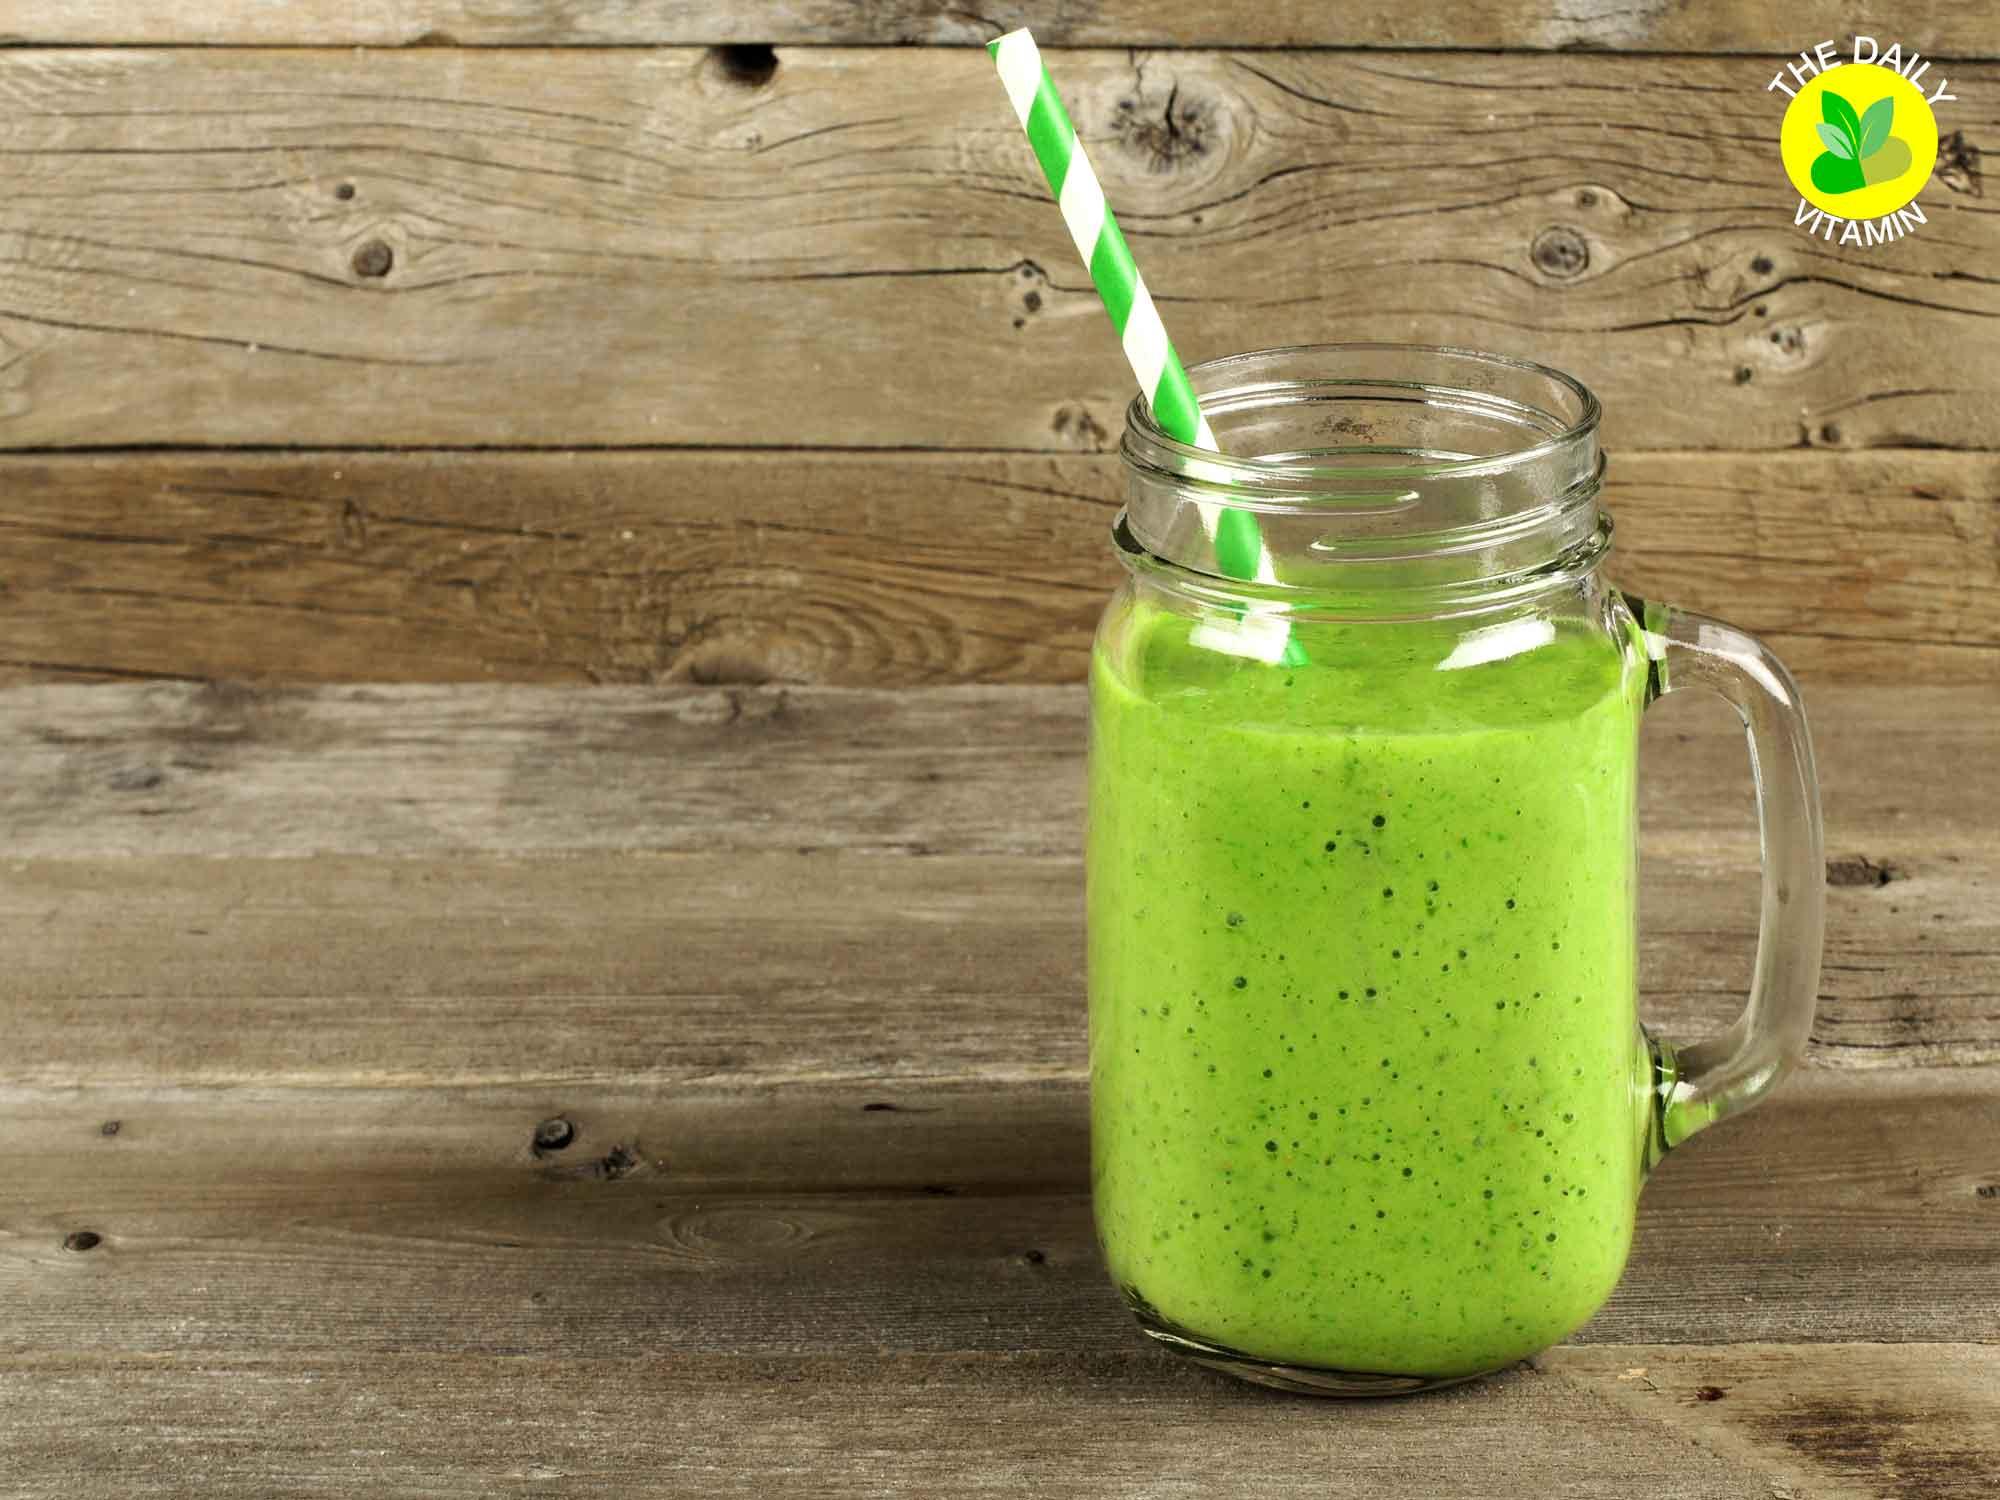 green smoothie, green smoothies, banana smoothie, vegetable smoothie, smoothie, smoothies, smoothie recipes, recipe, recipes, blender green smoothie, easy banana green smoothie, green smoothies with bananas, banana, green, blender, blend, blends, best, healthy green smoothie, easy to make, how to make, making, make, green smoothie recipe, spinach green smoothie, spinach banana green smoothie, best green smoothie recipes, daily vitamin, green drink, green drinks, blendtec green smoothie, vitamix green smoothie, blendtec, blendtech, vitamix, vita mix, nutribullet, blender, blenders, blending, blended, vegetable, vegan, low calorie,